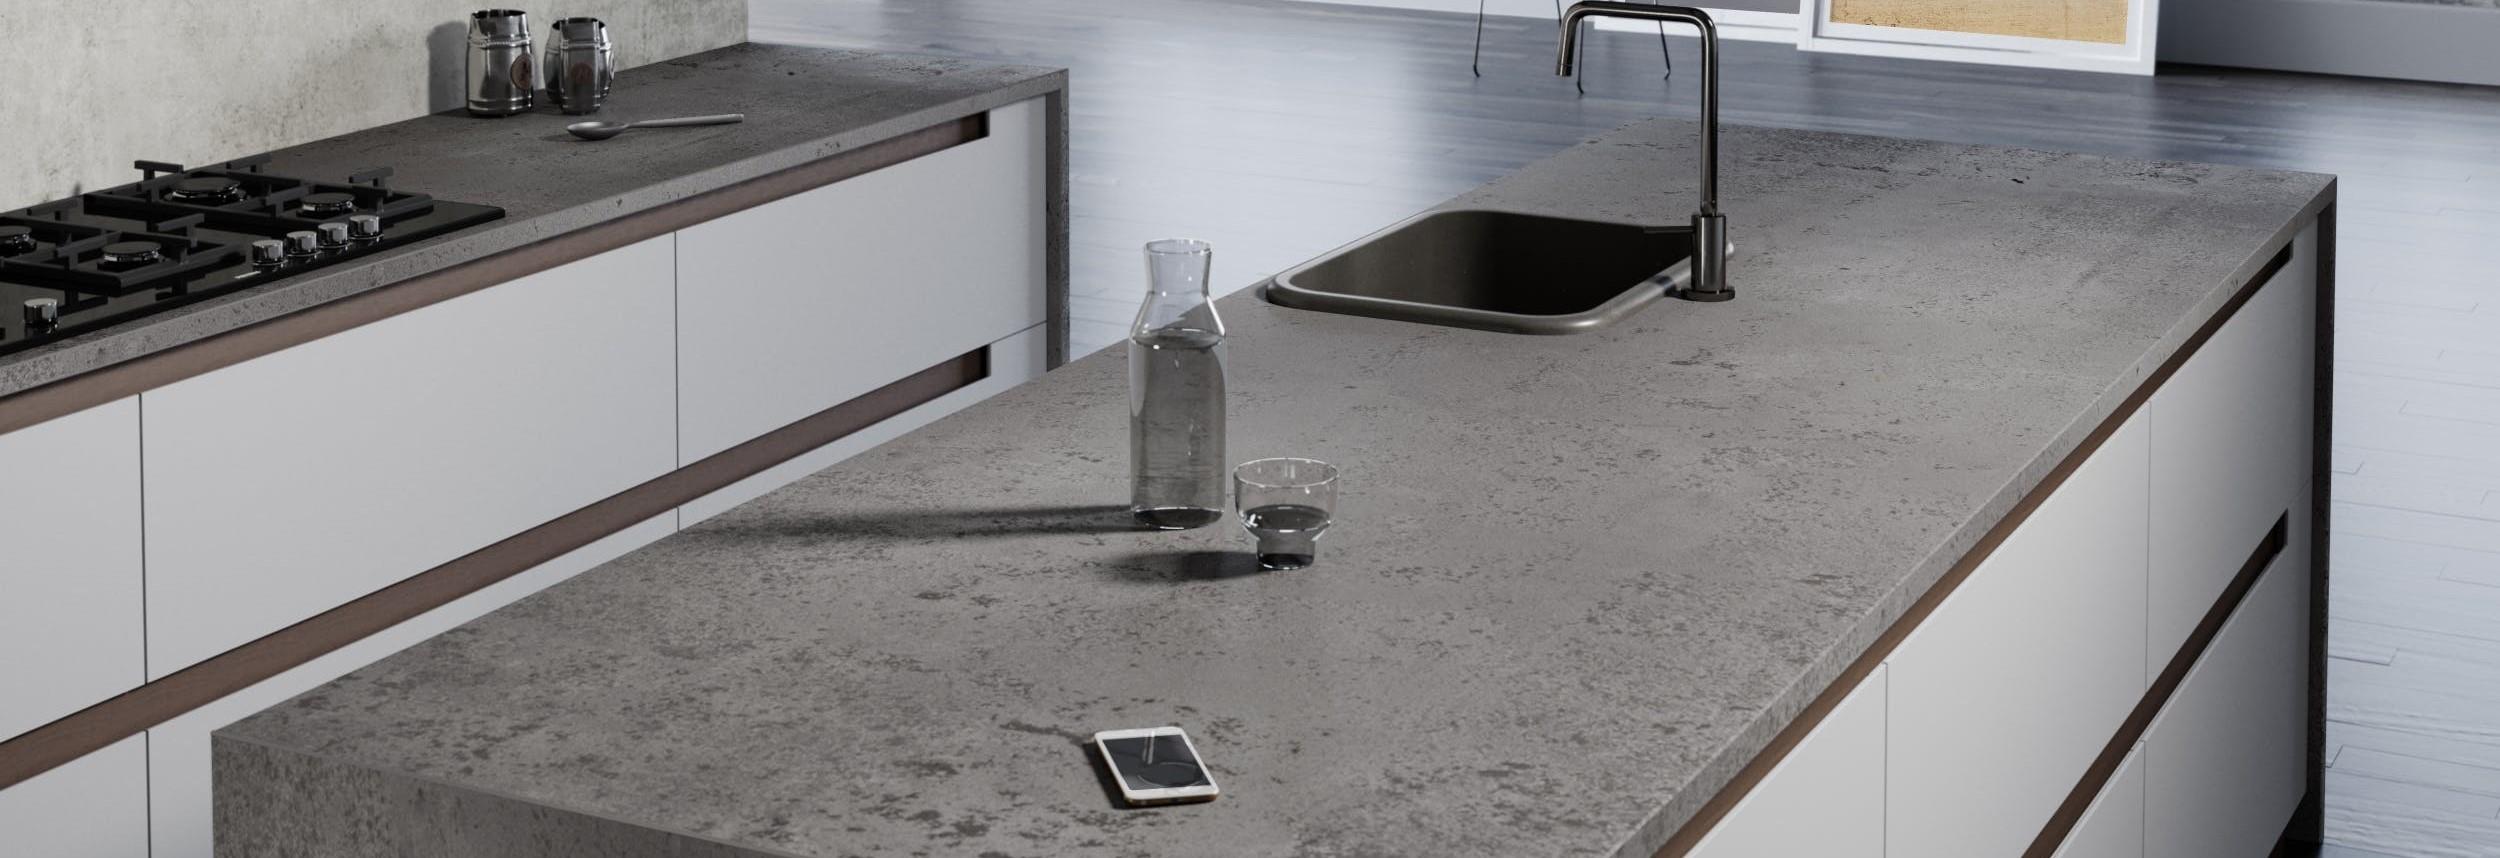 Silestone Benchtop Stone Kitchen Benchtop - Loft series Brooklyn-lr (2)